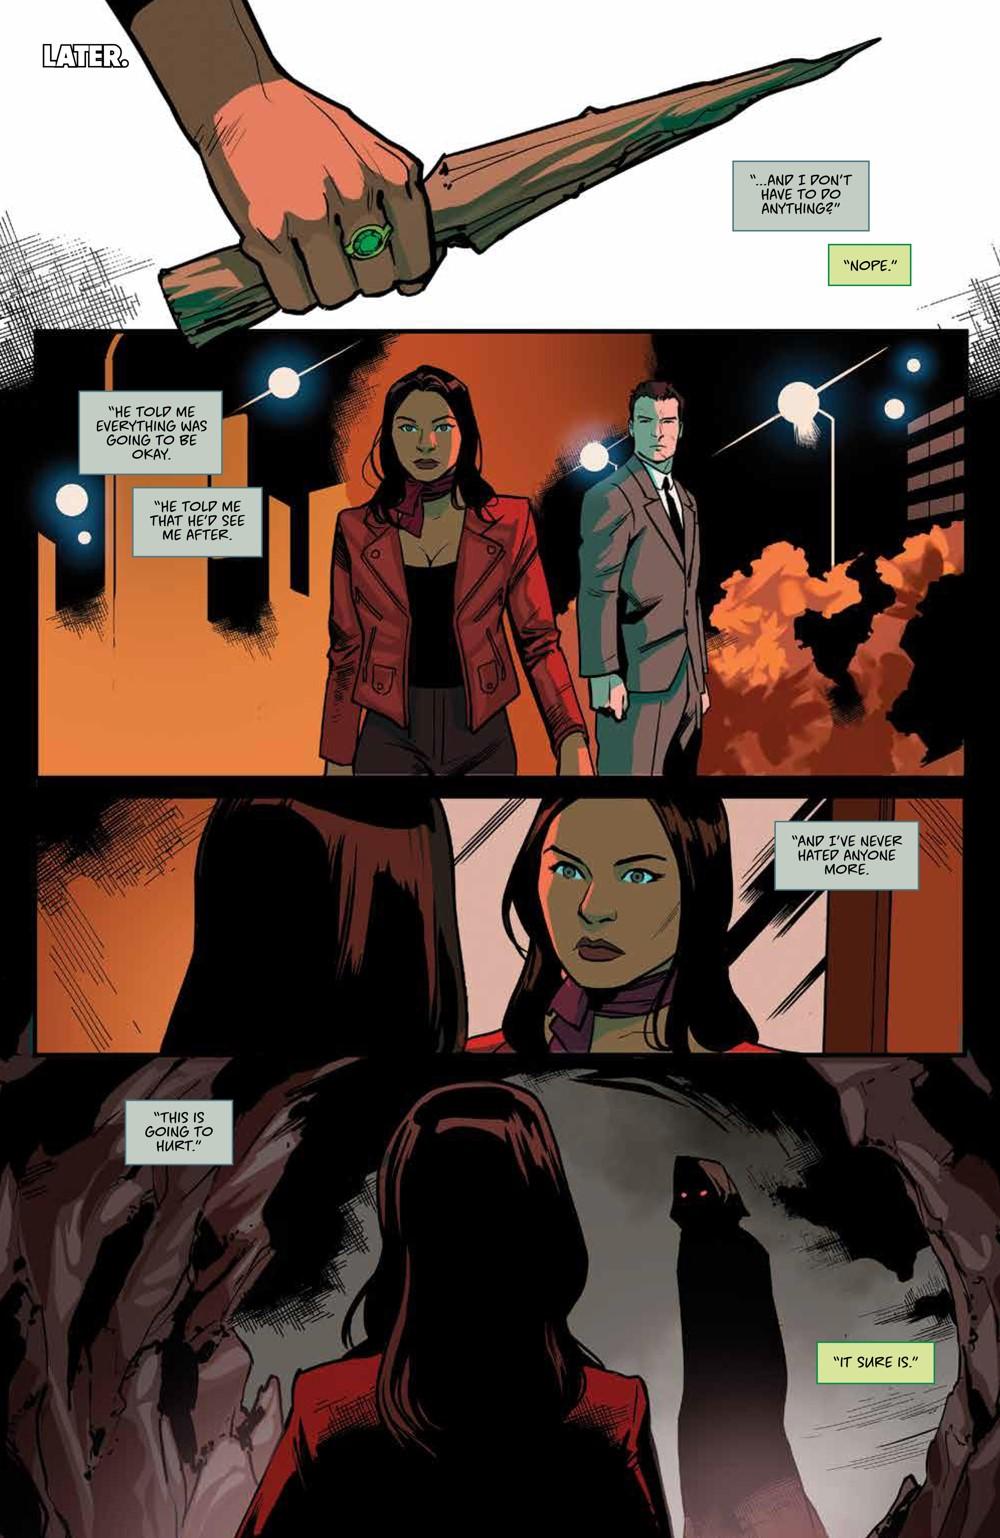 Buffy_v6_SC_PRESS_21 ComicList Previews: BUFFY THE VAMPIRE SLAYER VOLUME 6 SECRETS OF THE SLAYER TP